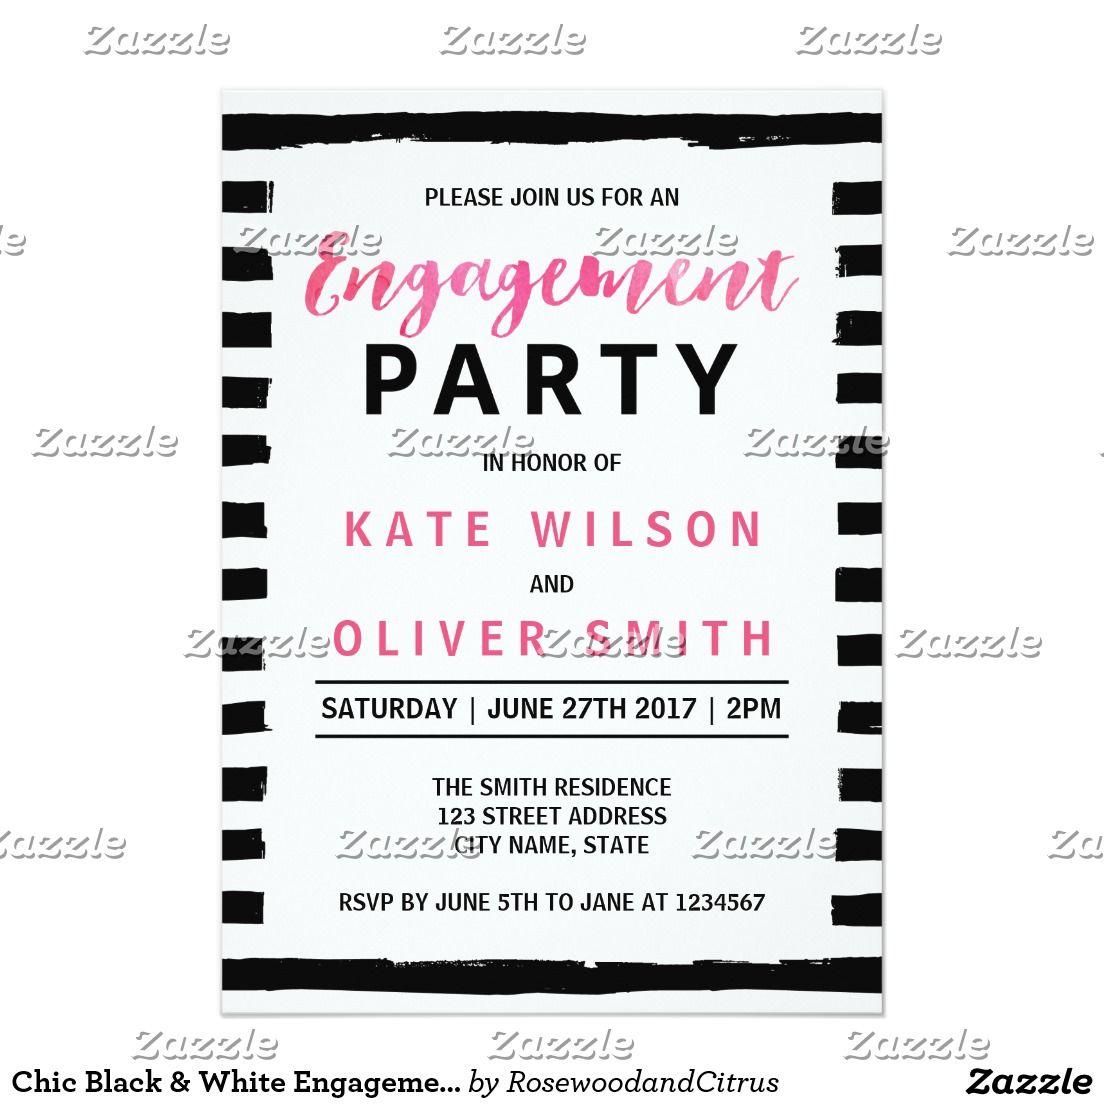 Chic Black & White Engagement Party Invitation | WEDDING Invitations ...